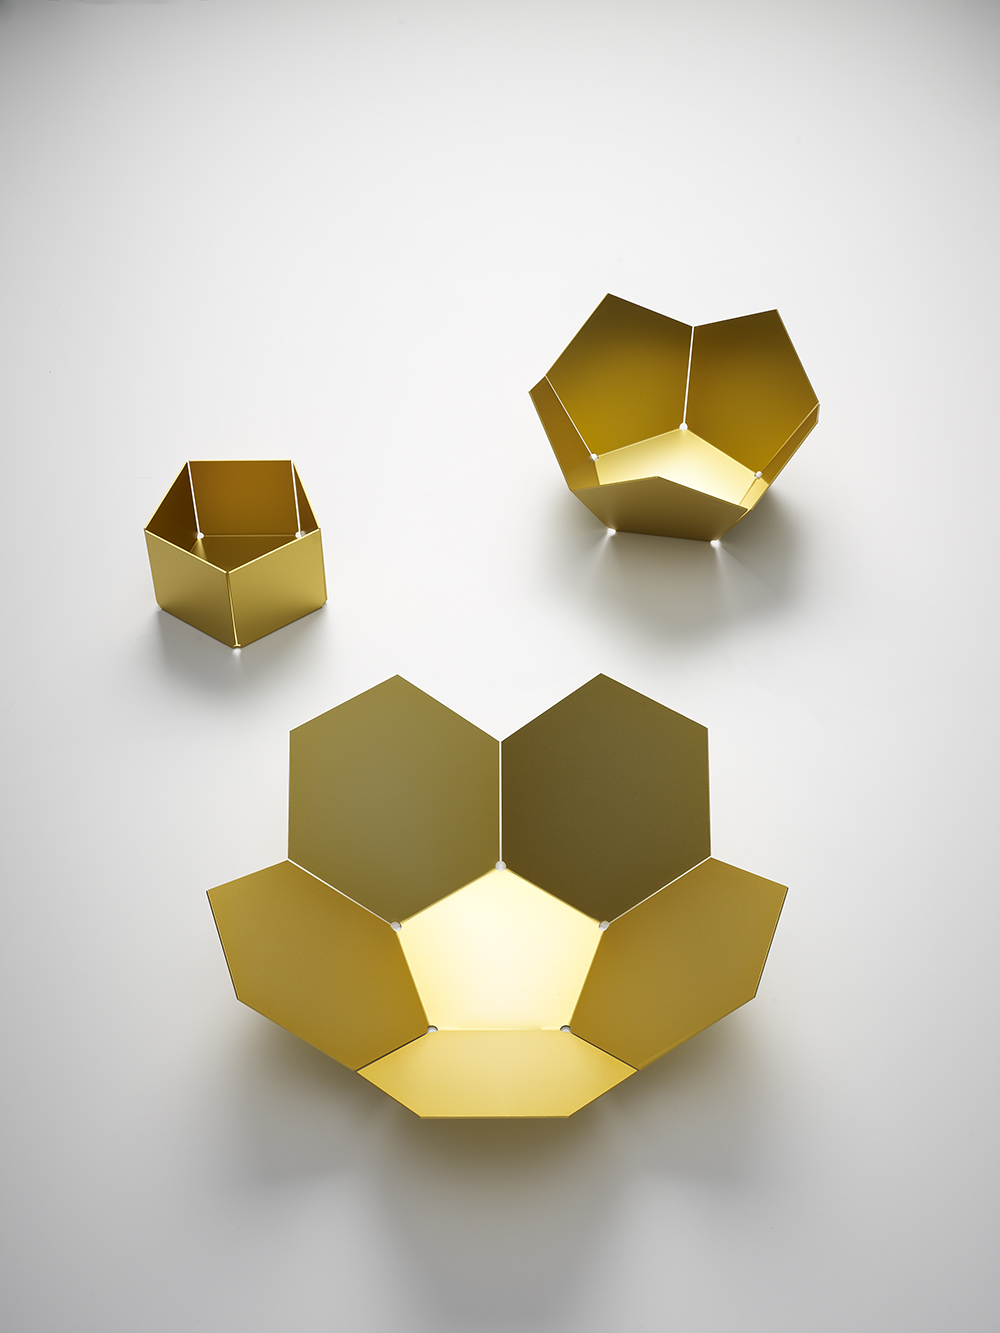 Brooksbank&Collins_Me-Far_Tria_Light Gold_2_1000pix